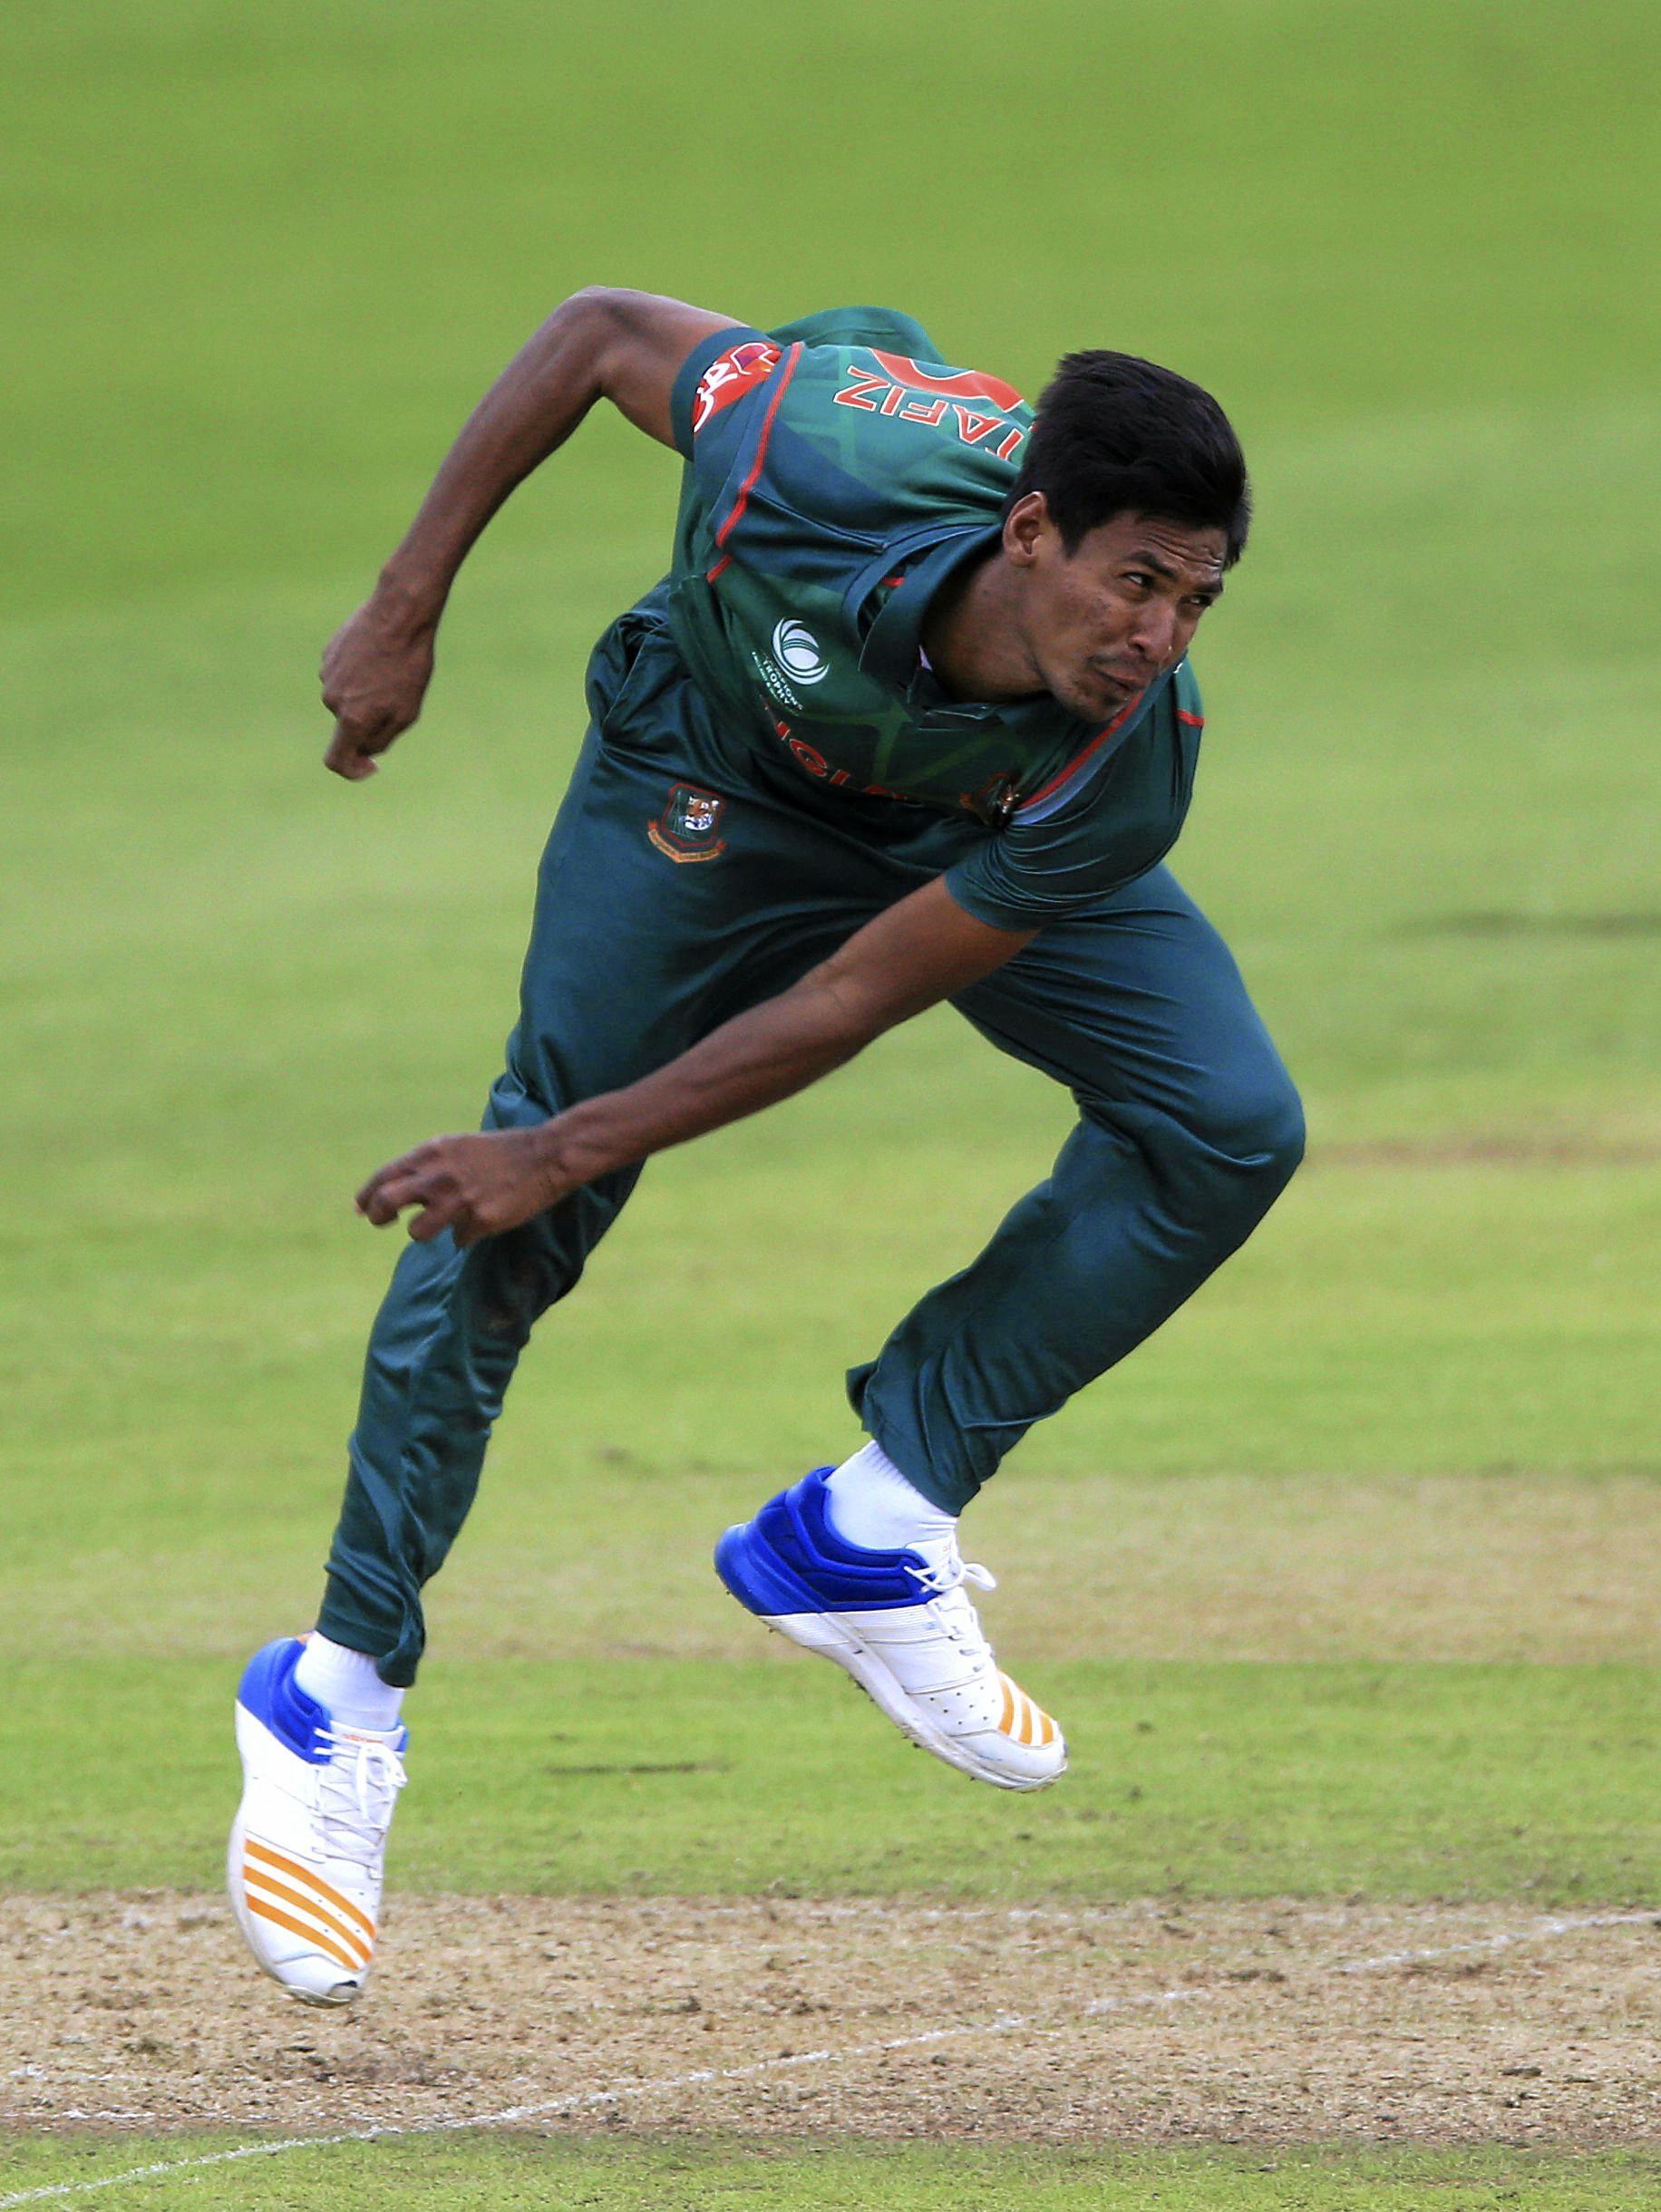 Bangladesh's Mustafizur Rahman bowls during the ICC Champions Trophy, Group A cricket match between New Zealand and Bangladesh, at Sophia Gardens, Cardiff, Wales, Friday June 9, 2017. (Nigel French/PA via AP)